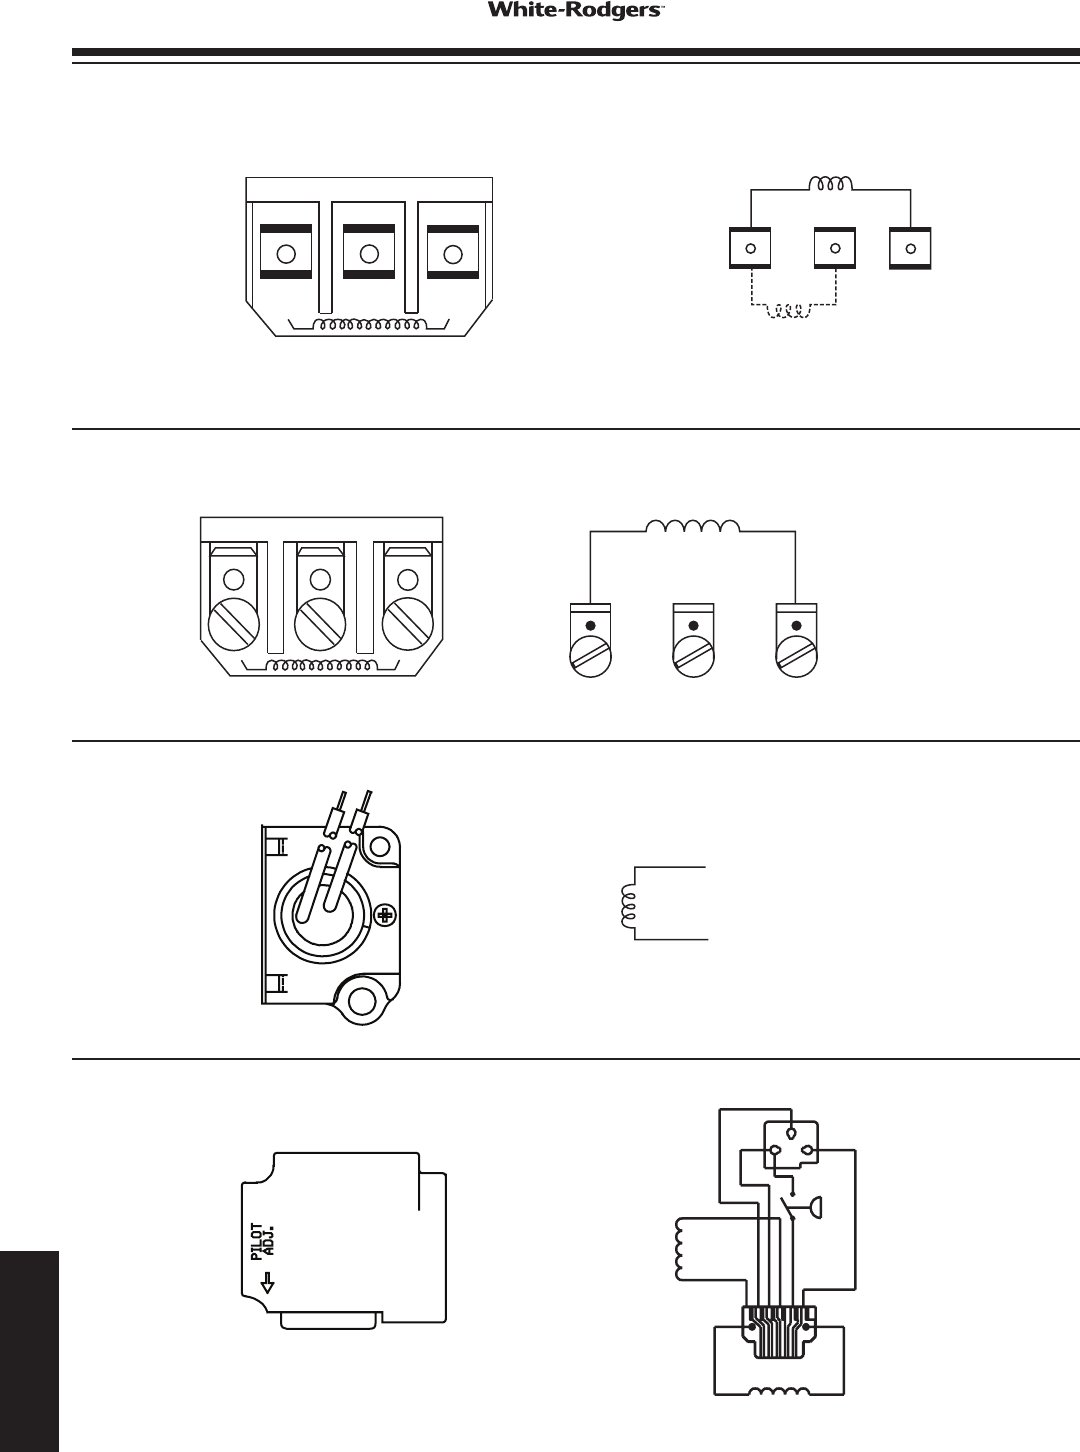 White Rodgers Gas Valve Wiring Diagram | Schematic Diagram - White Rodgers Gas Valve Wiring Diagram